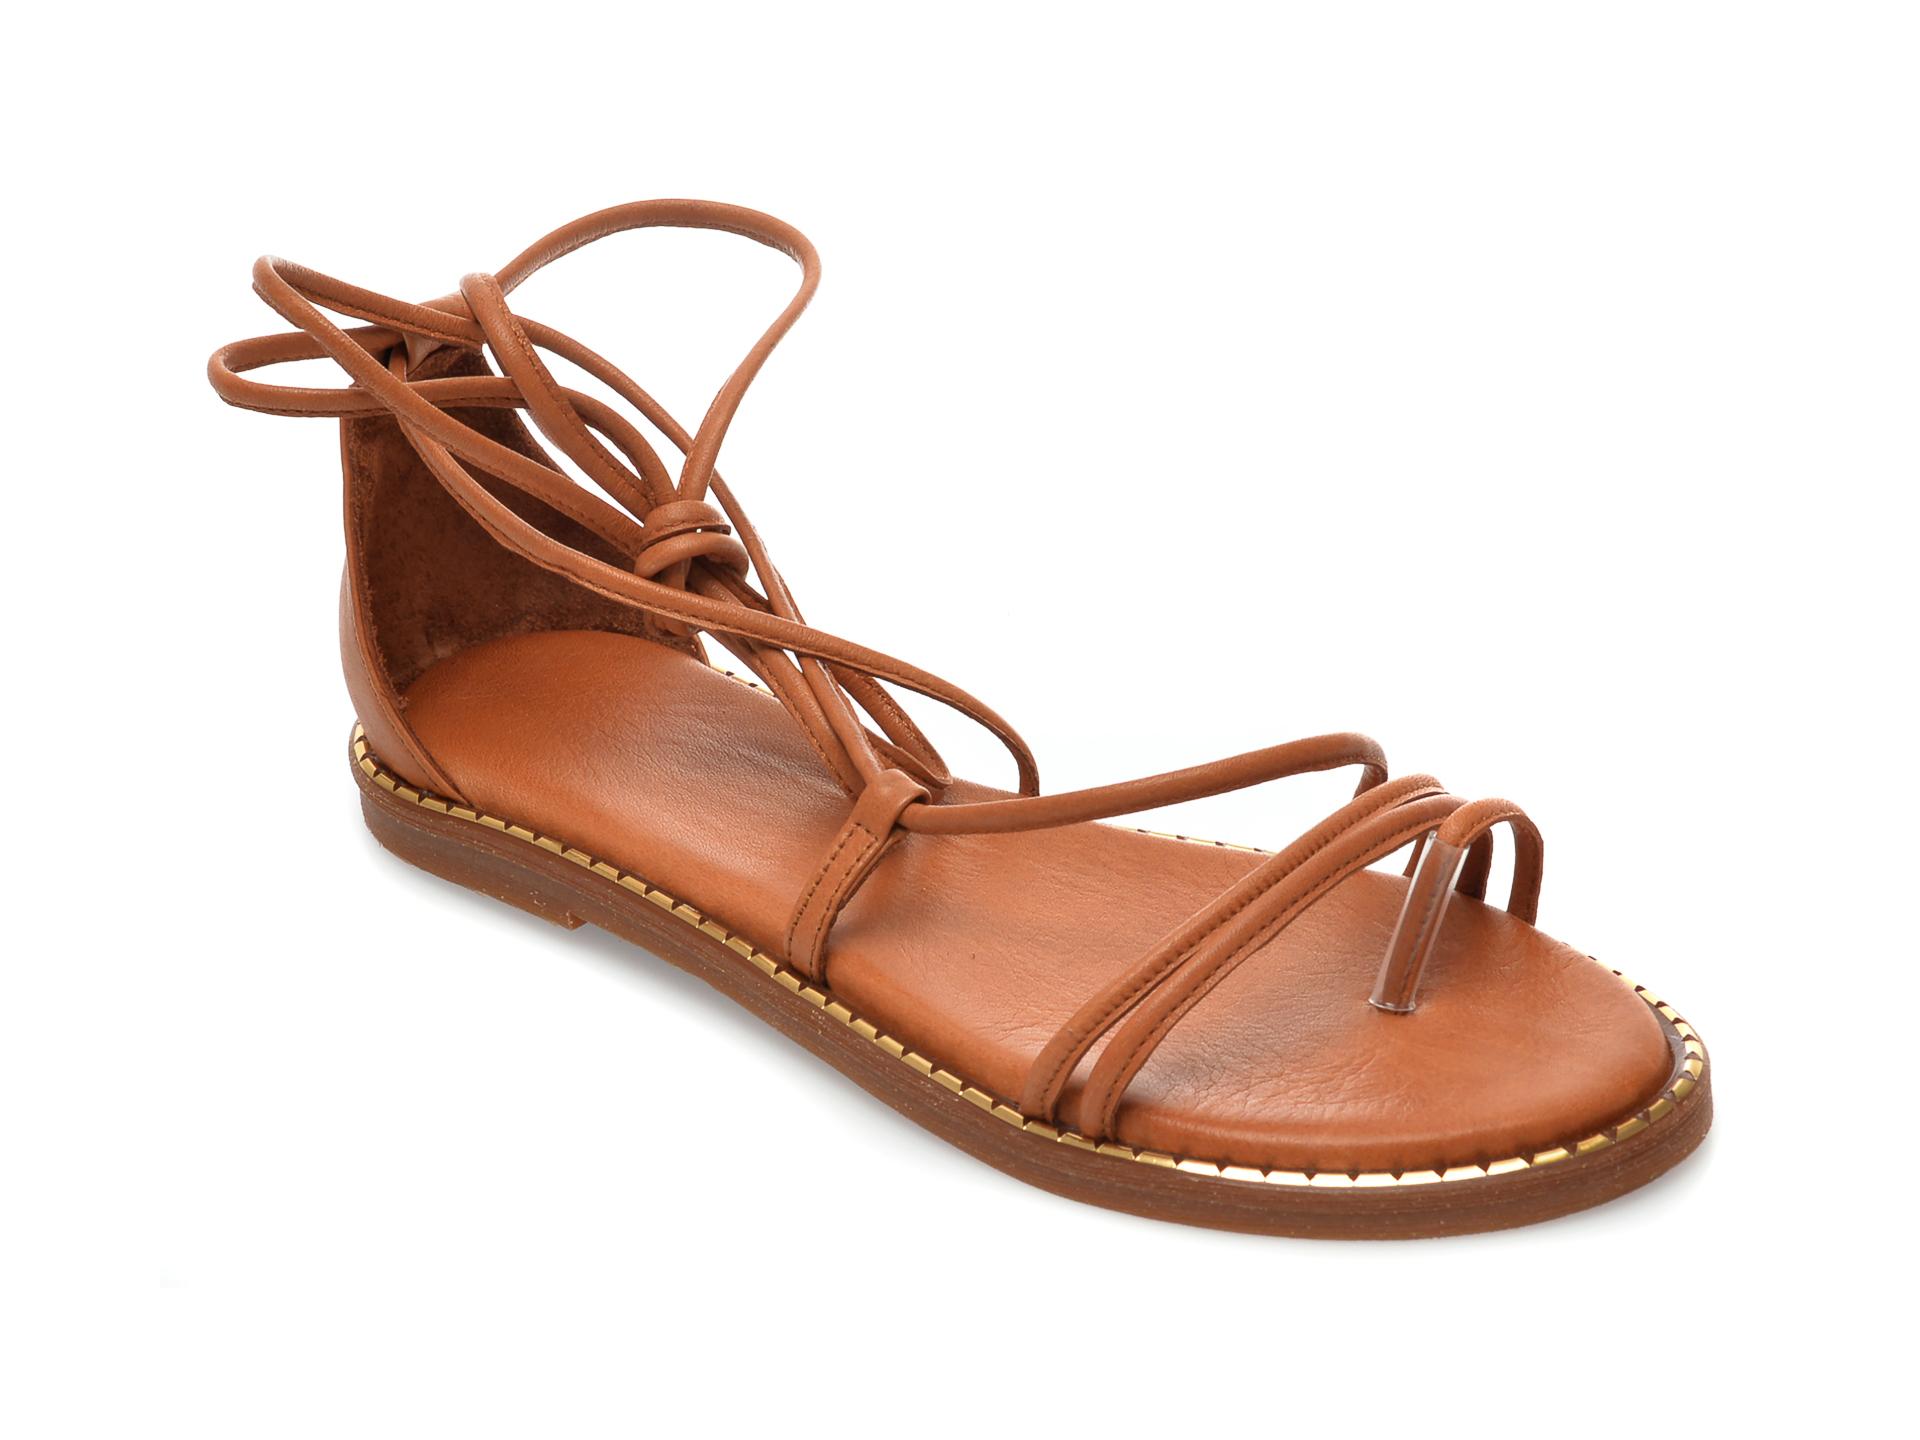 Sandale IMAGE maro, 732, din piele naturala imagine otter.ro 2021